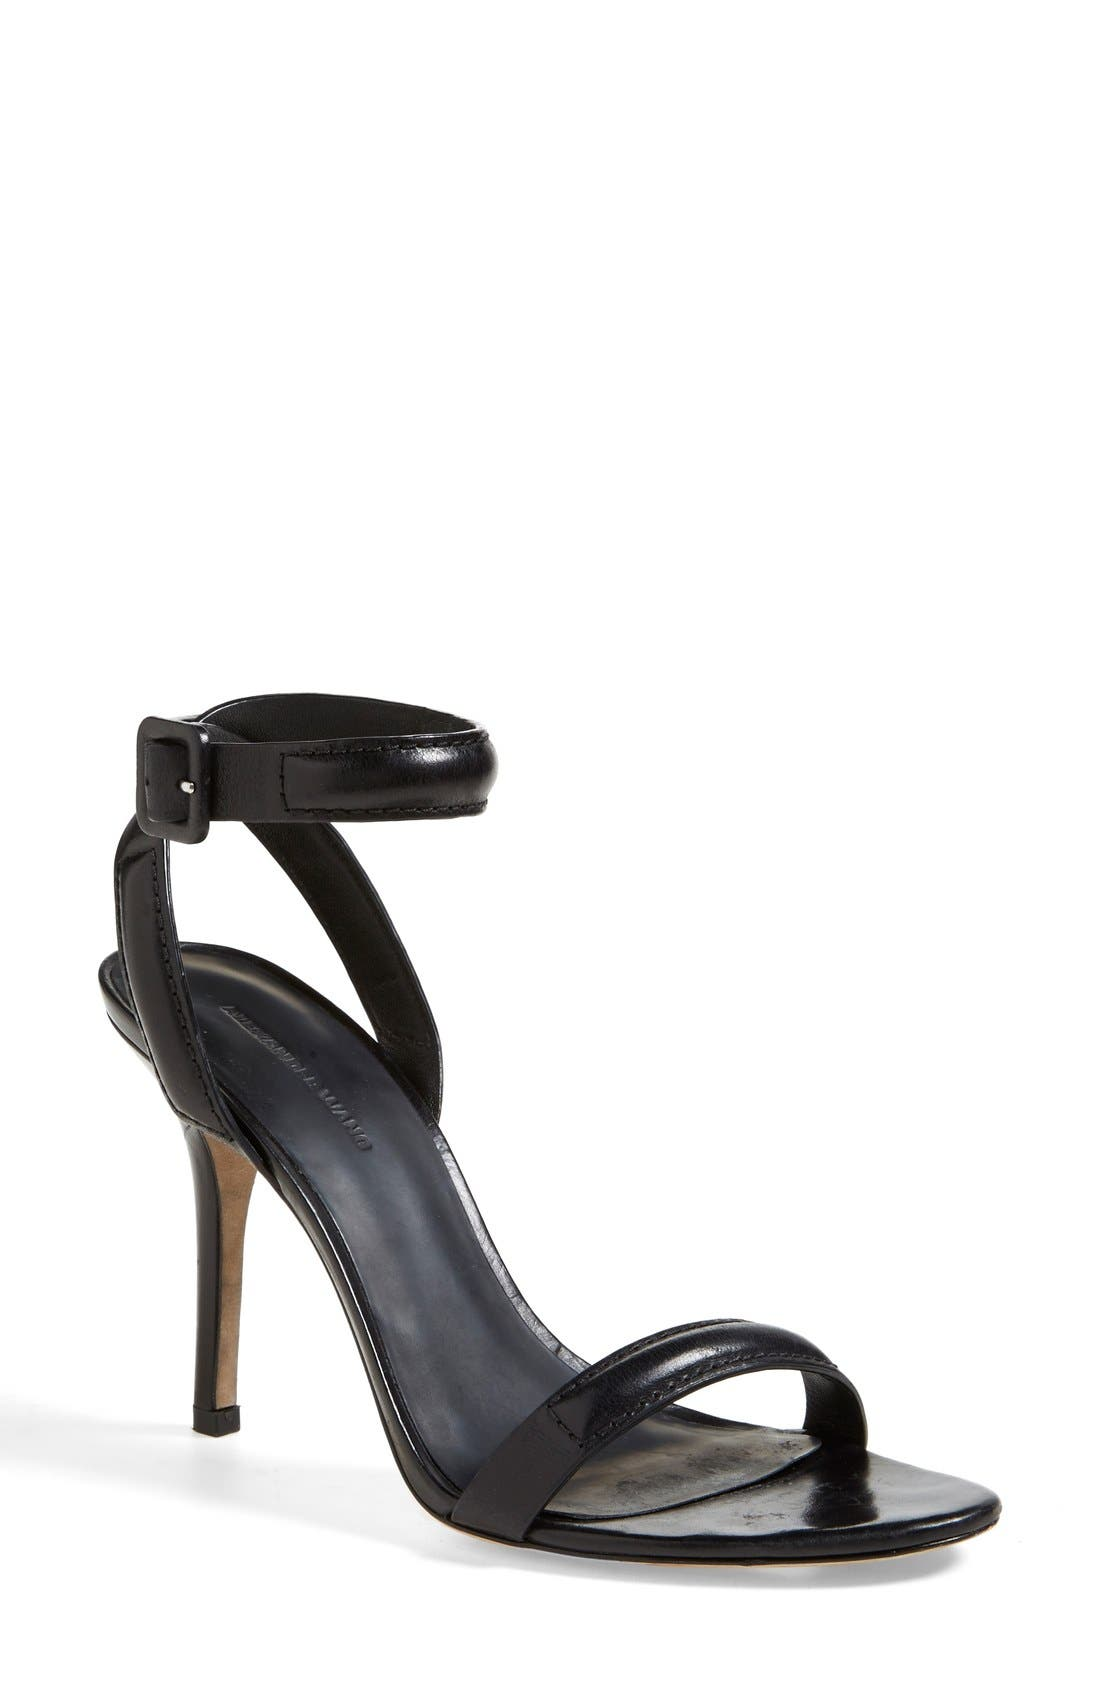 ALEXANDER WANG 'Antonia' Ankle Strap Sandal